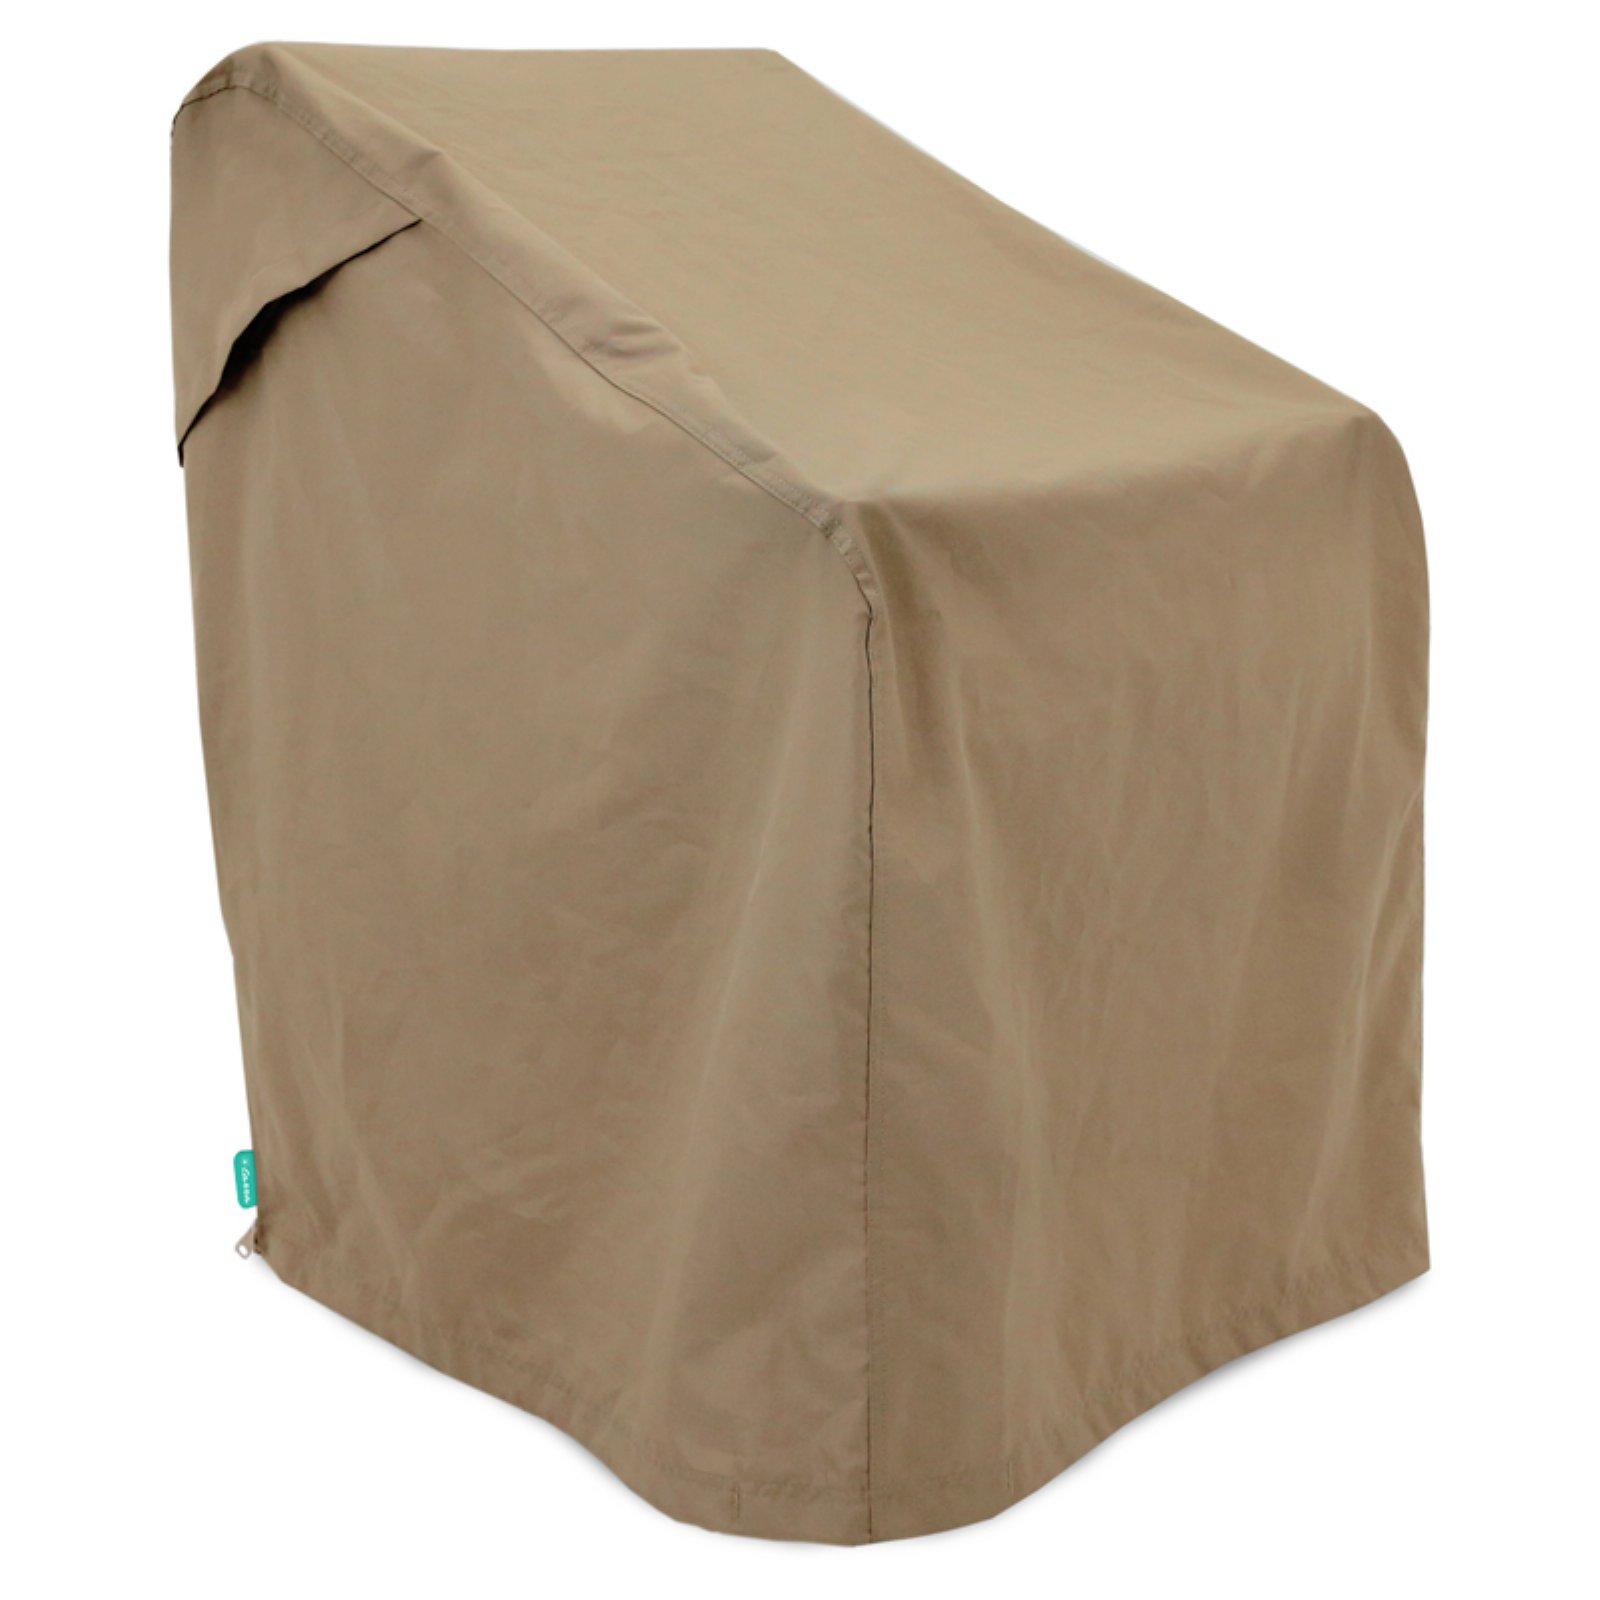 Tarra Home Universal Outdoor UFCCP282433PT Patio Chair Cover